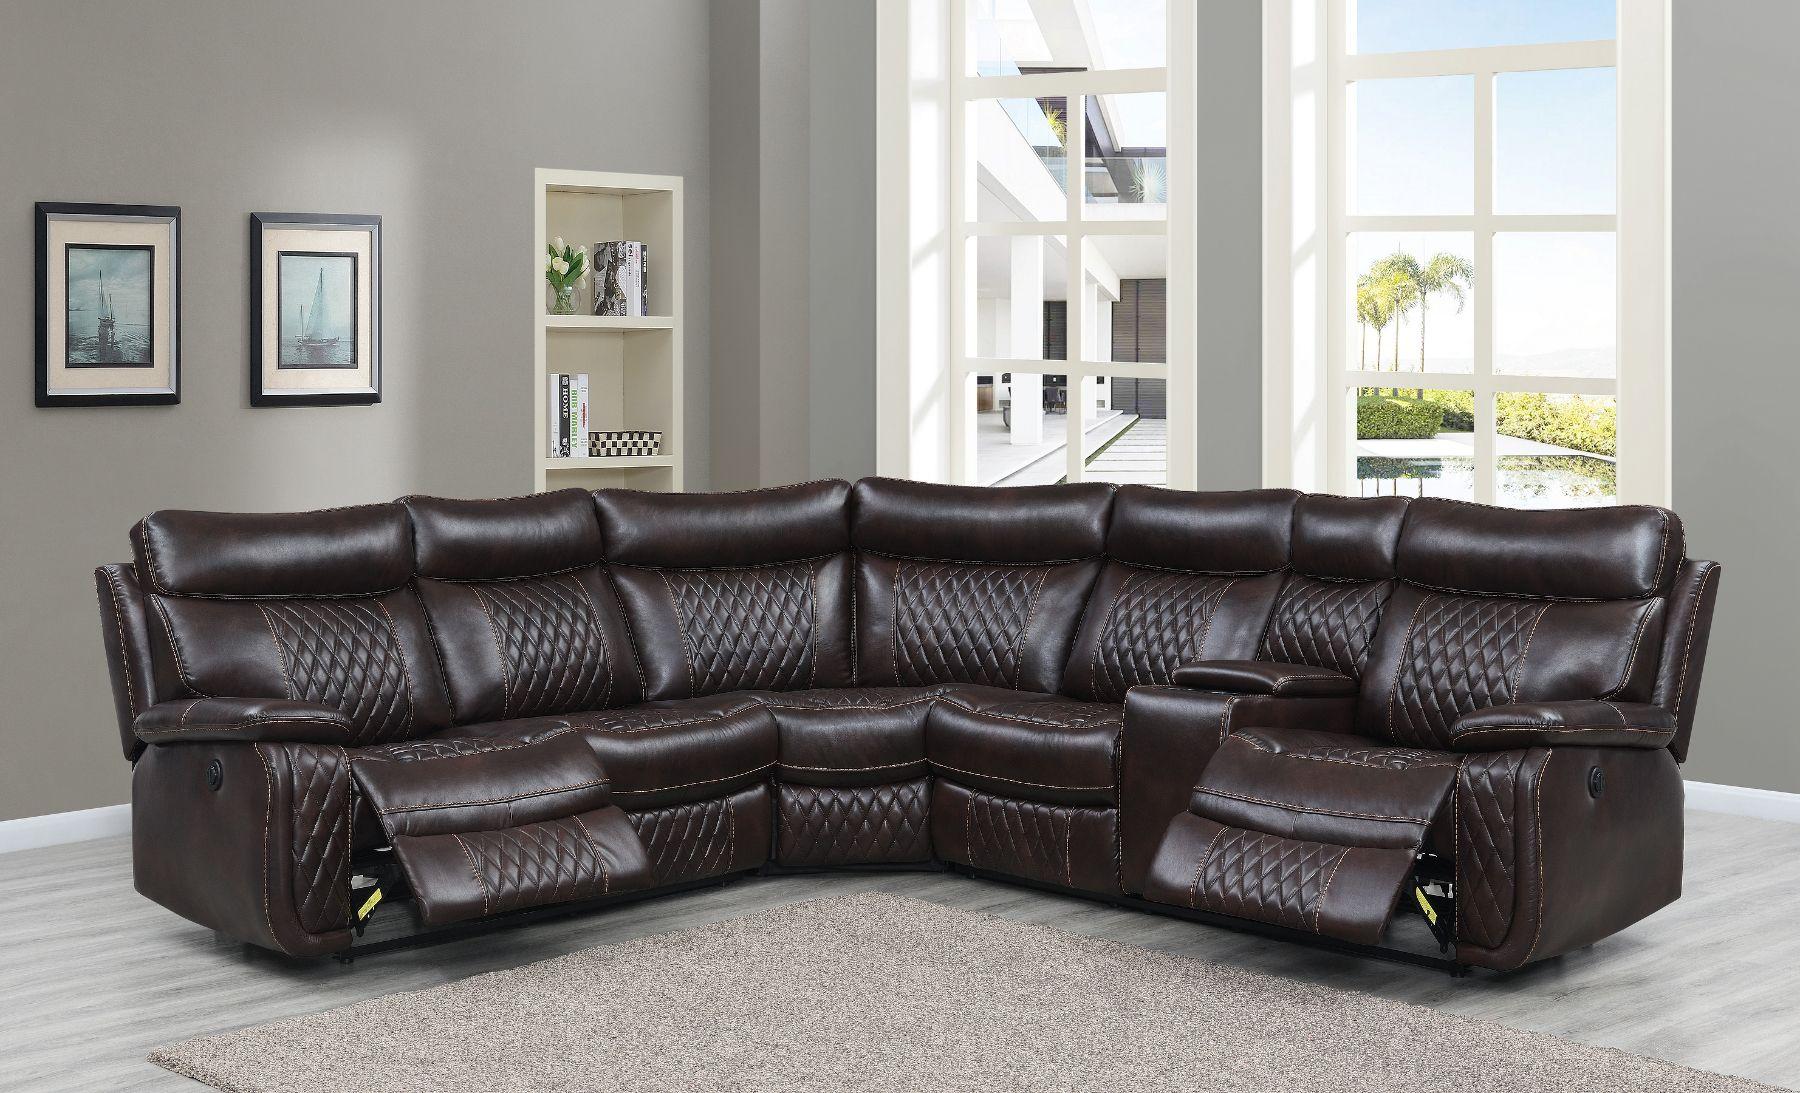 G7260 Sectional Sofa